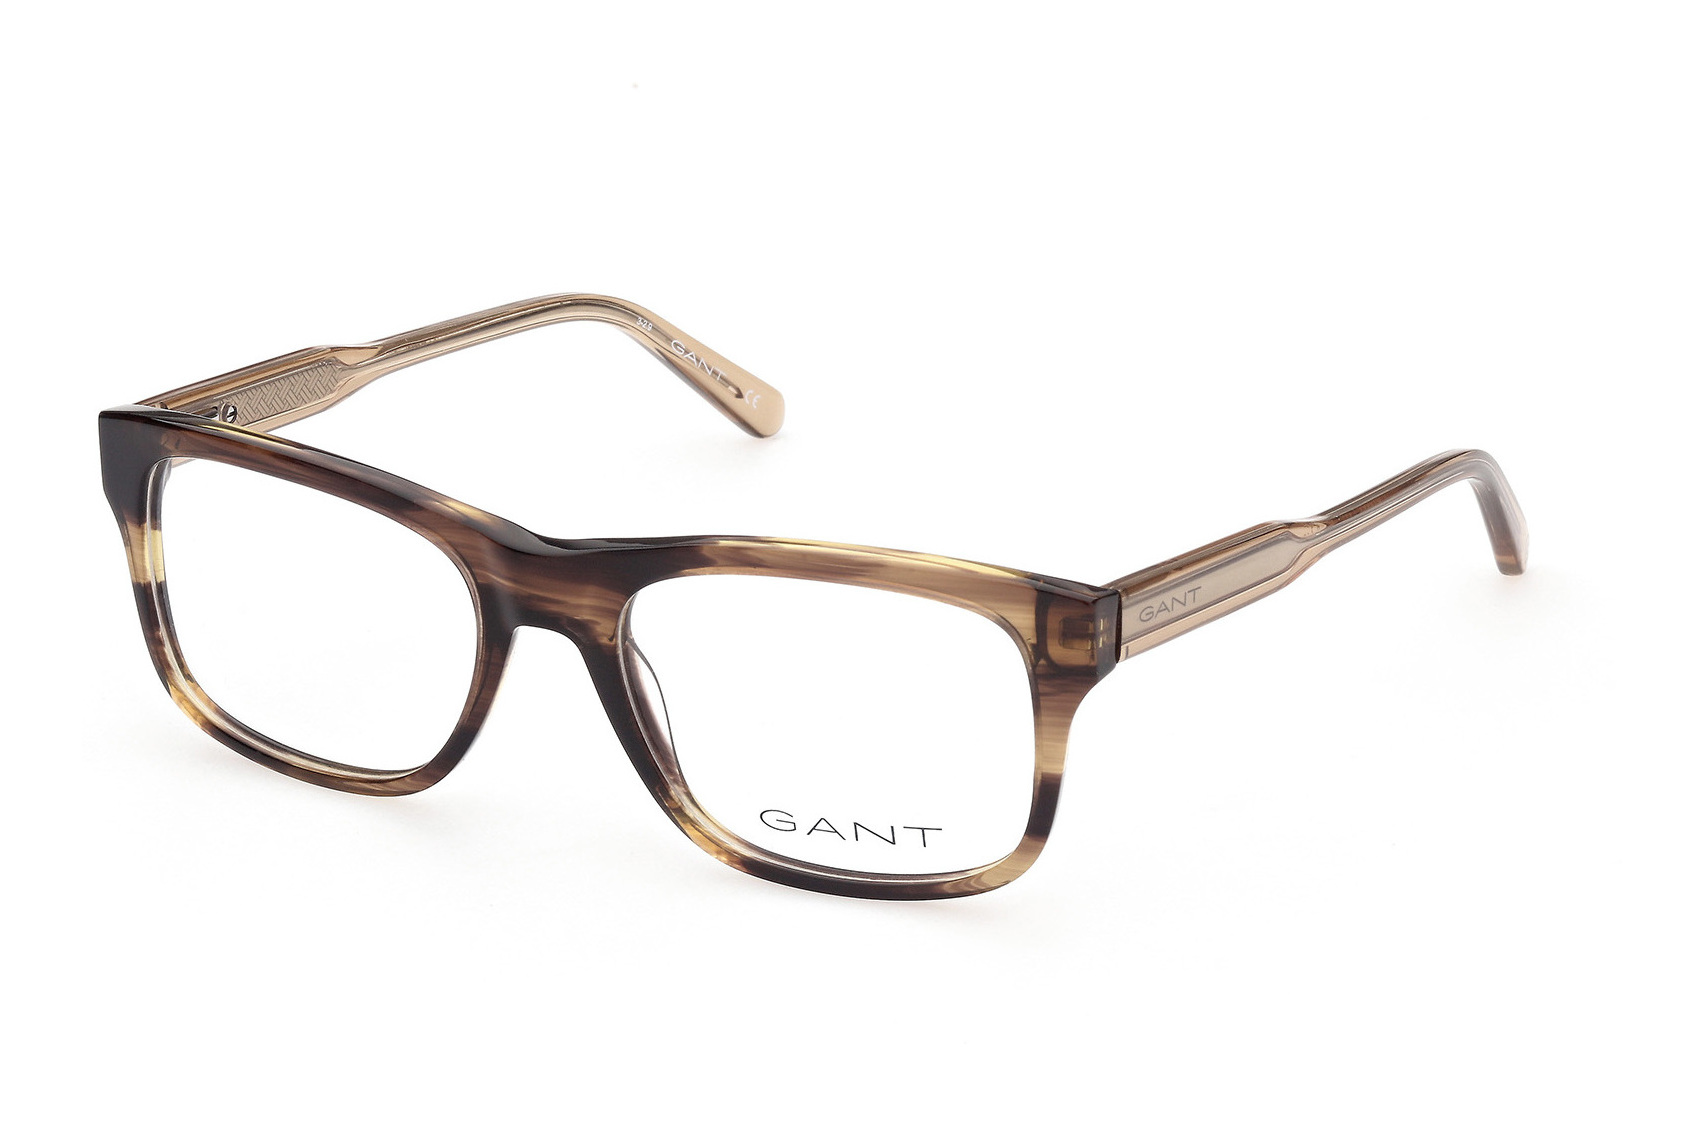 Gant Ga3224